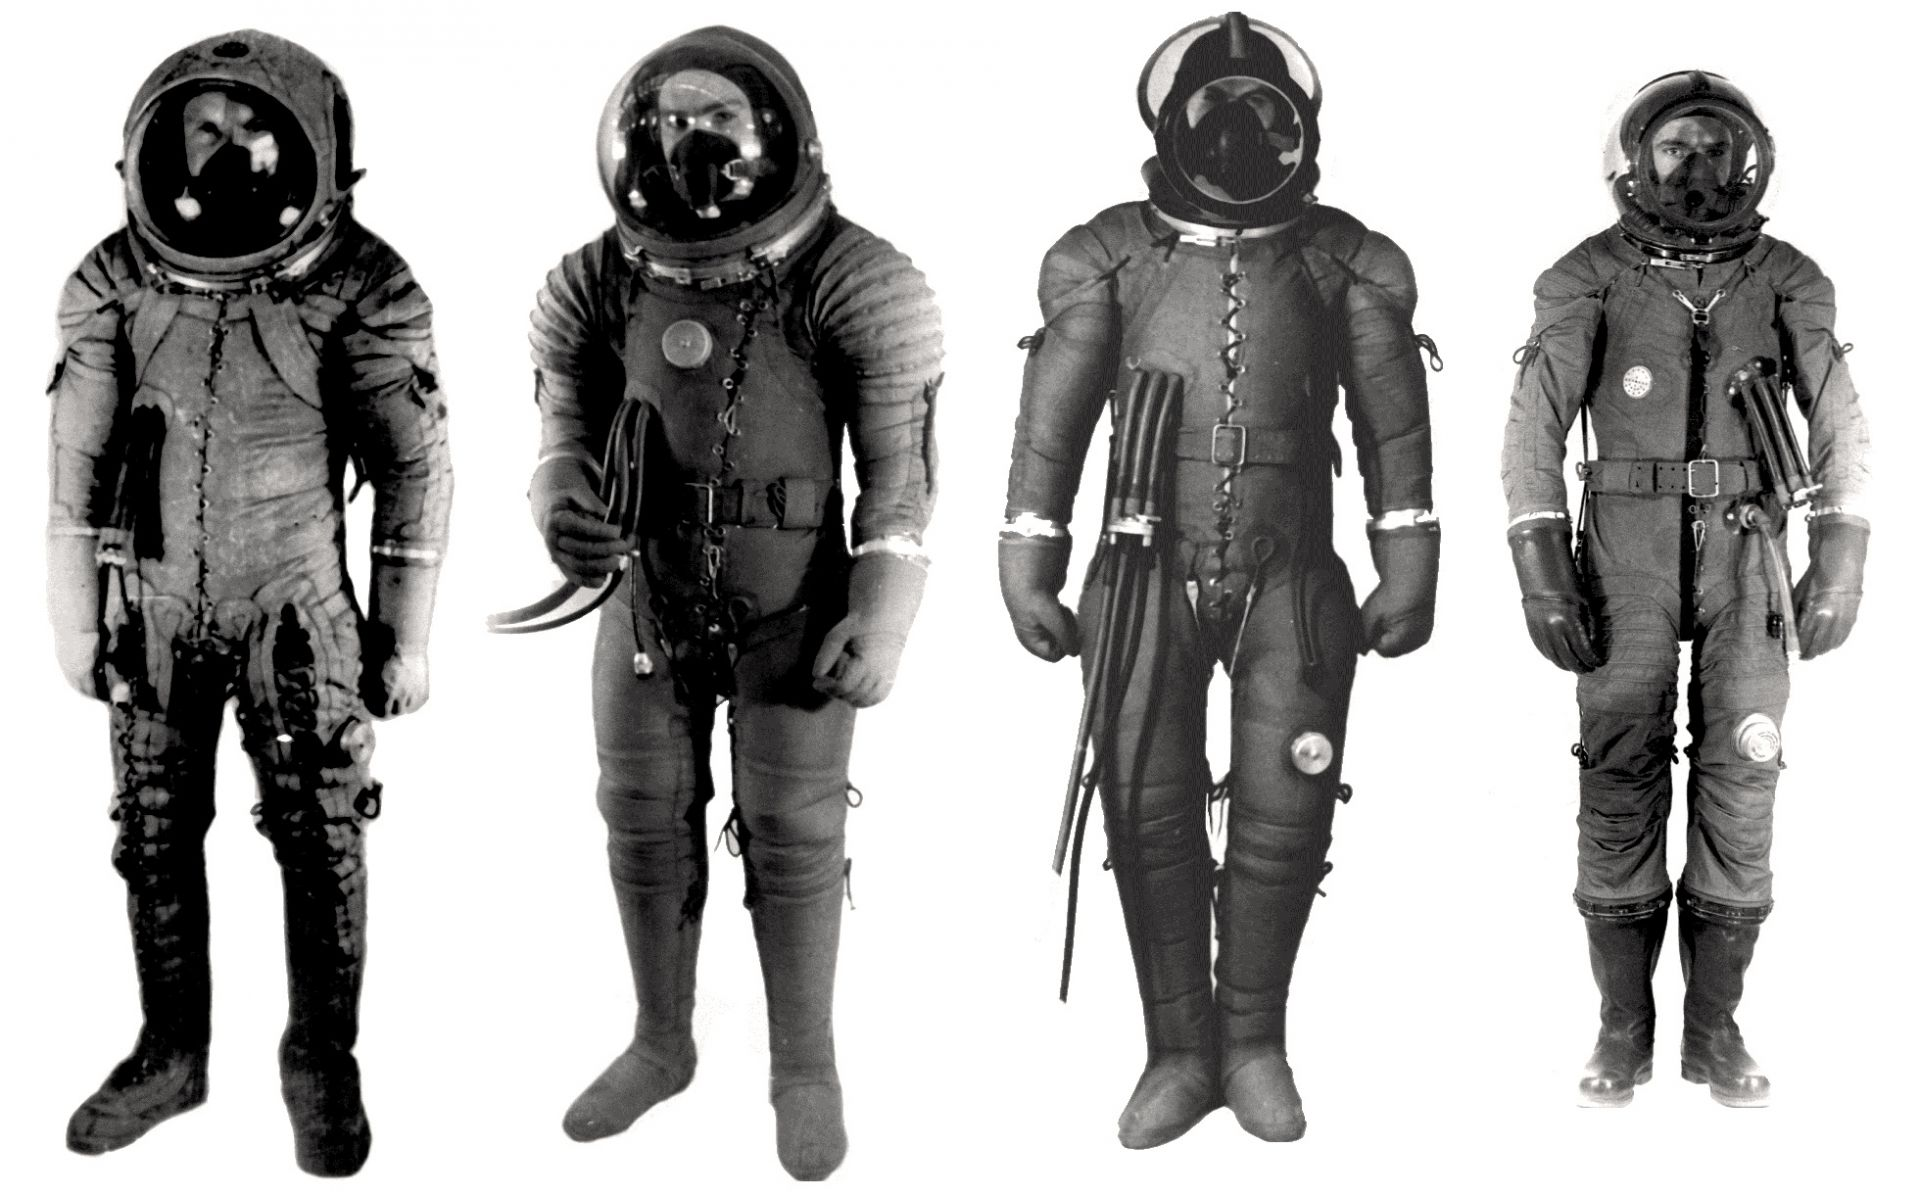 retro astronaut costume - HD1920×1196